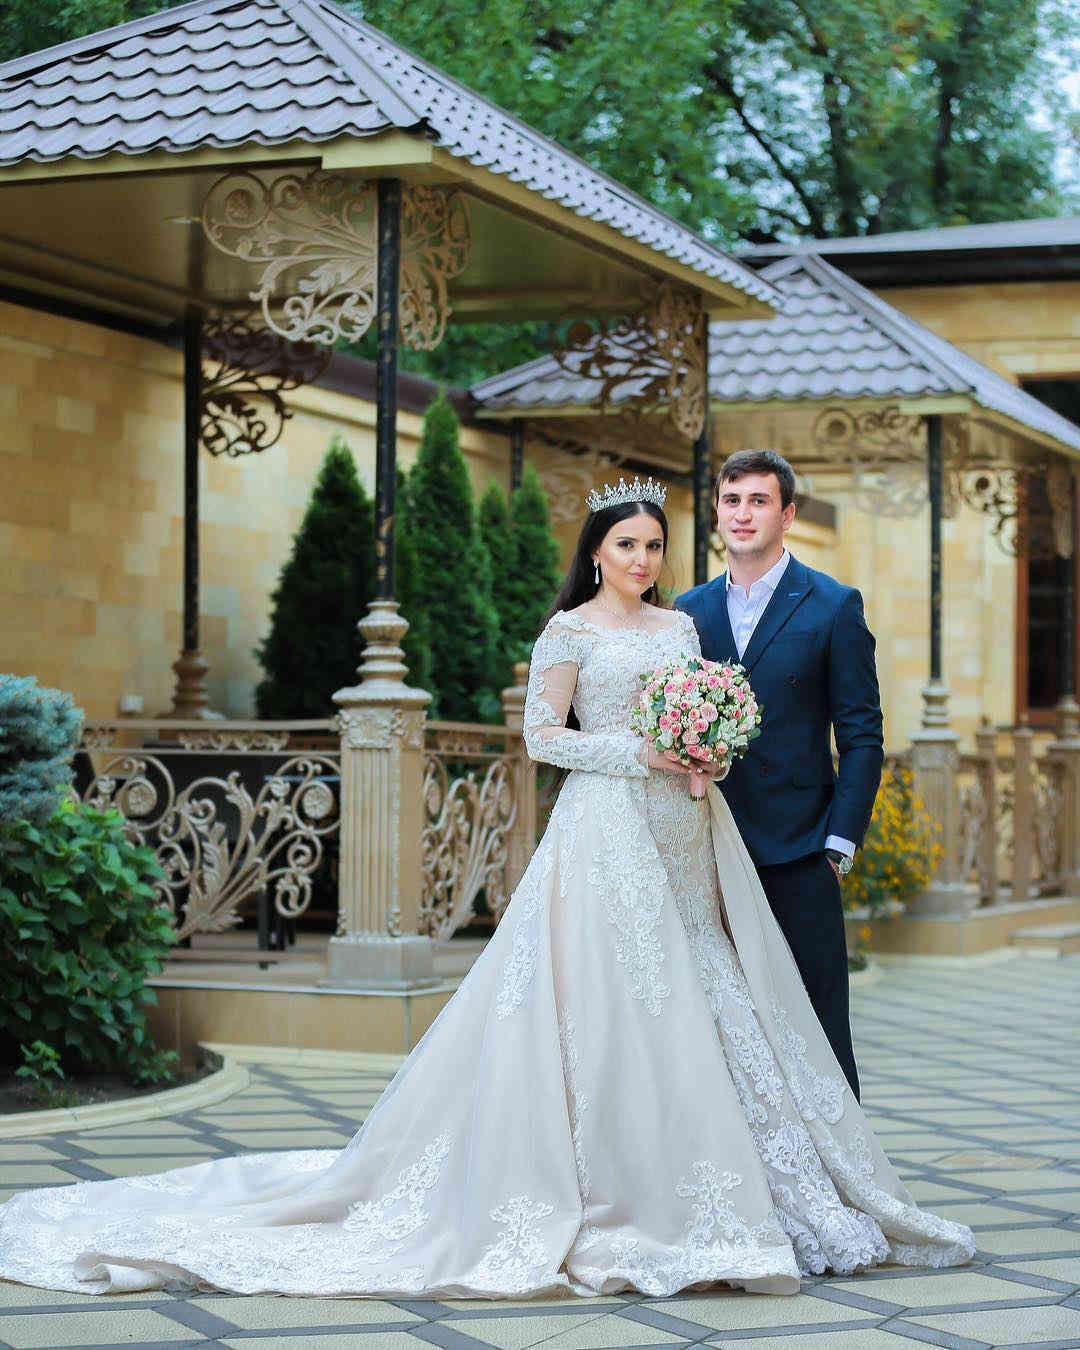 Saudi Arabic Plus Size Wedding Dresses Scoop Neck Long Sleeve A Line Bridal Gowns Sweep Train Lace Beach Wedding Dress